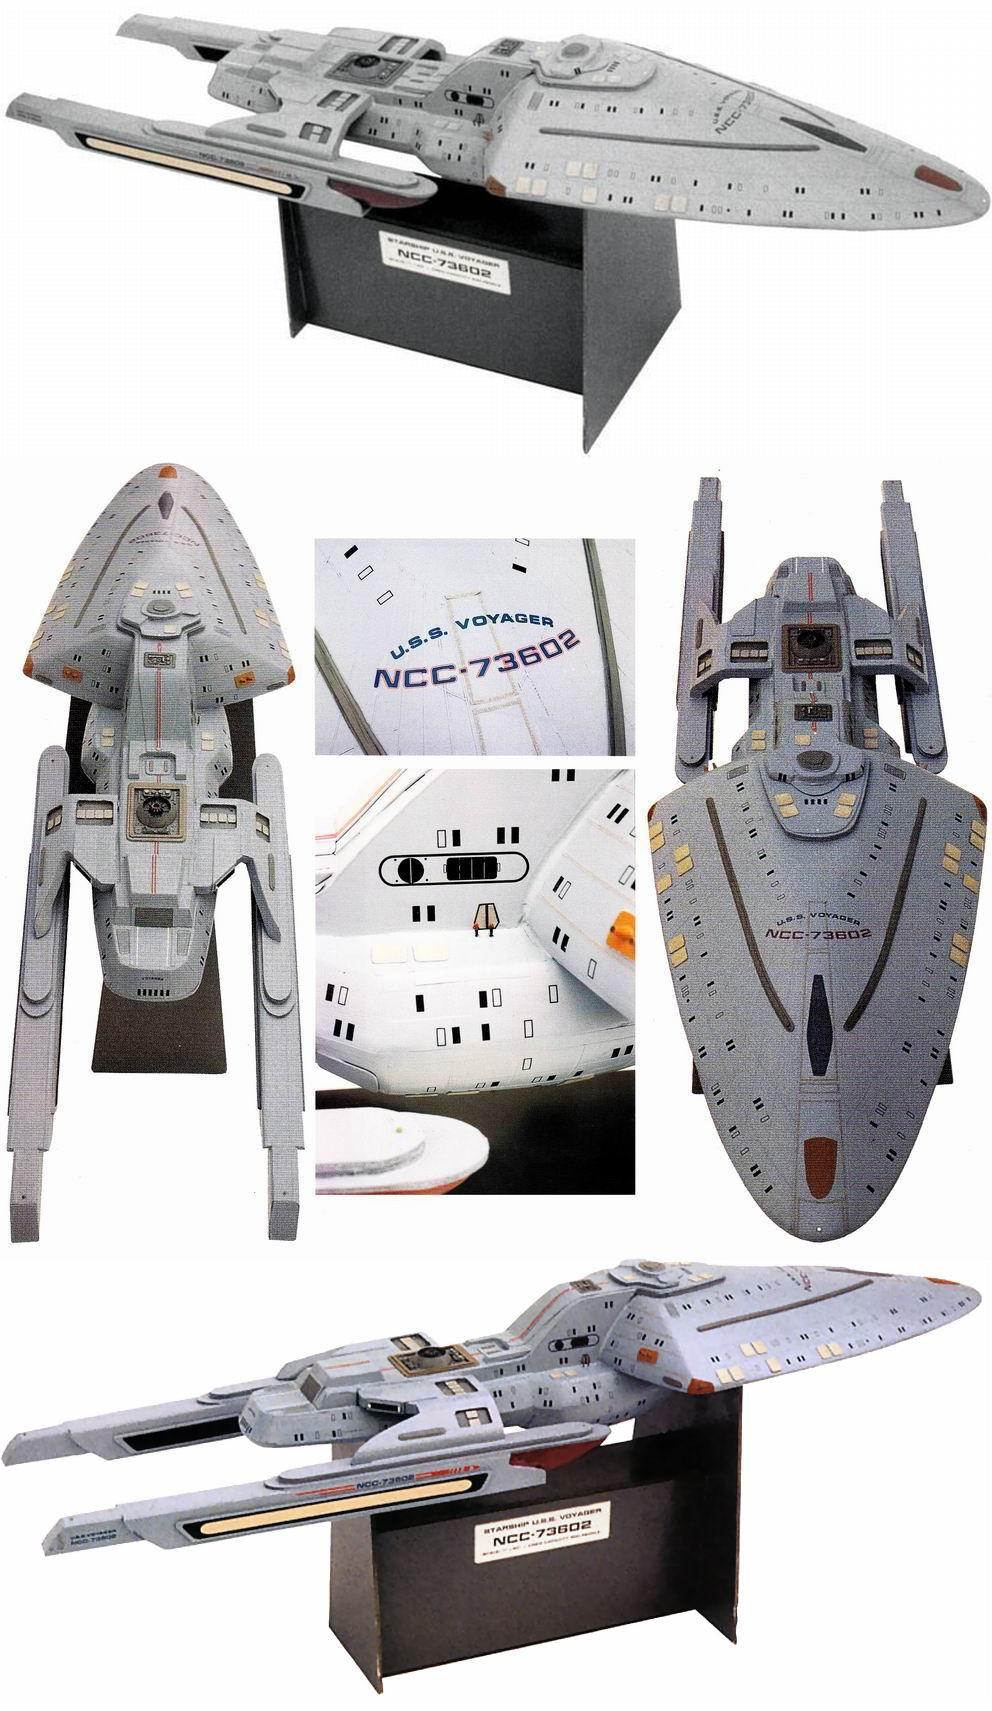 USS_Voyager_prototype_model.jpg